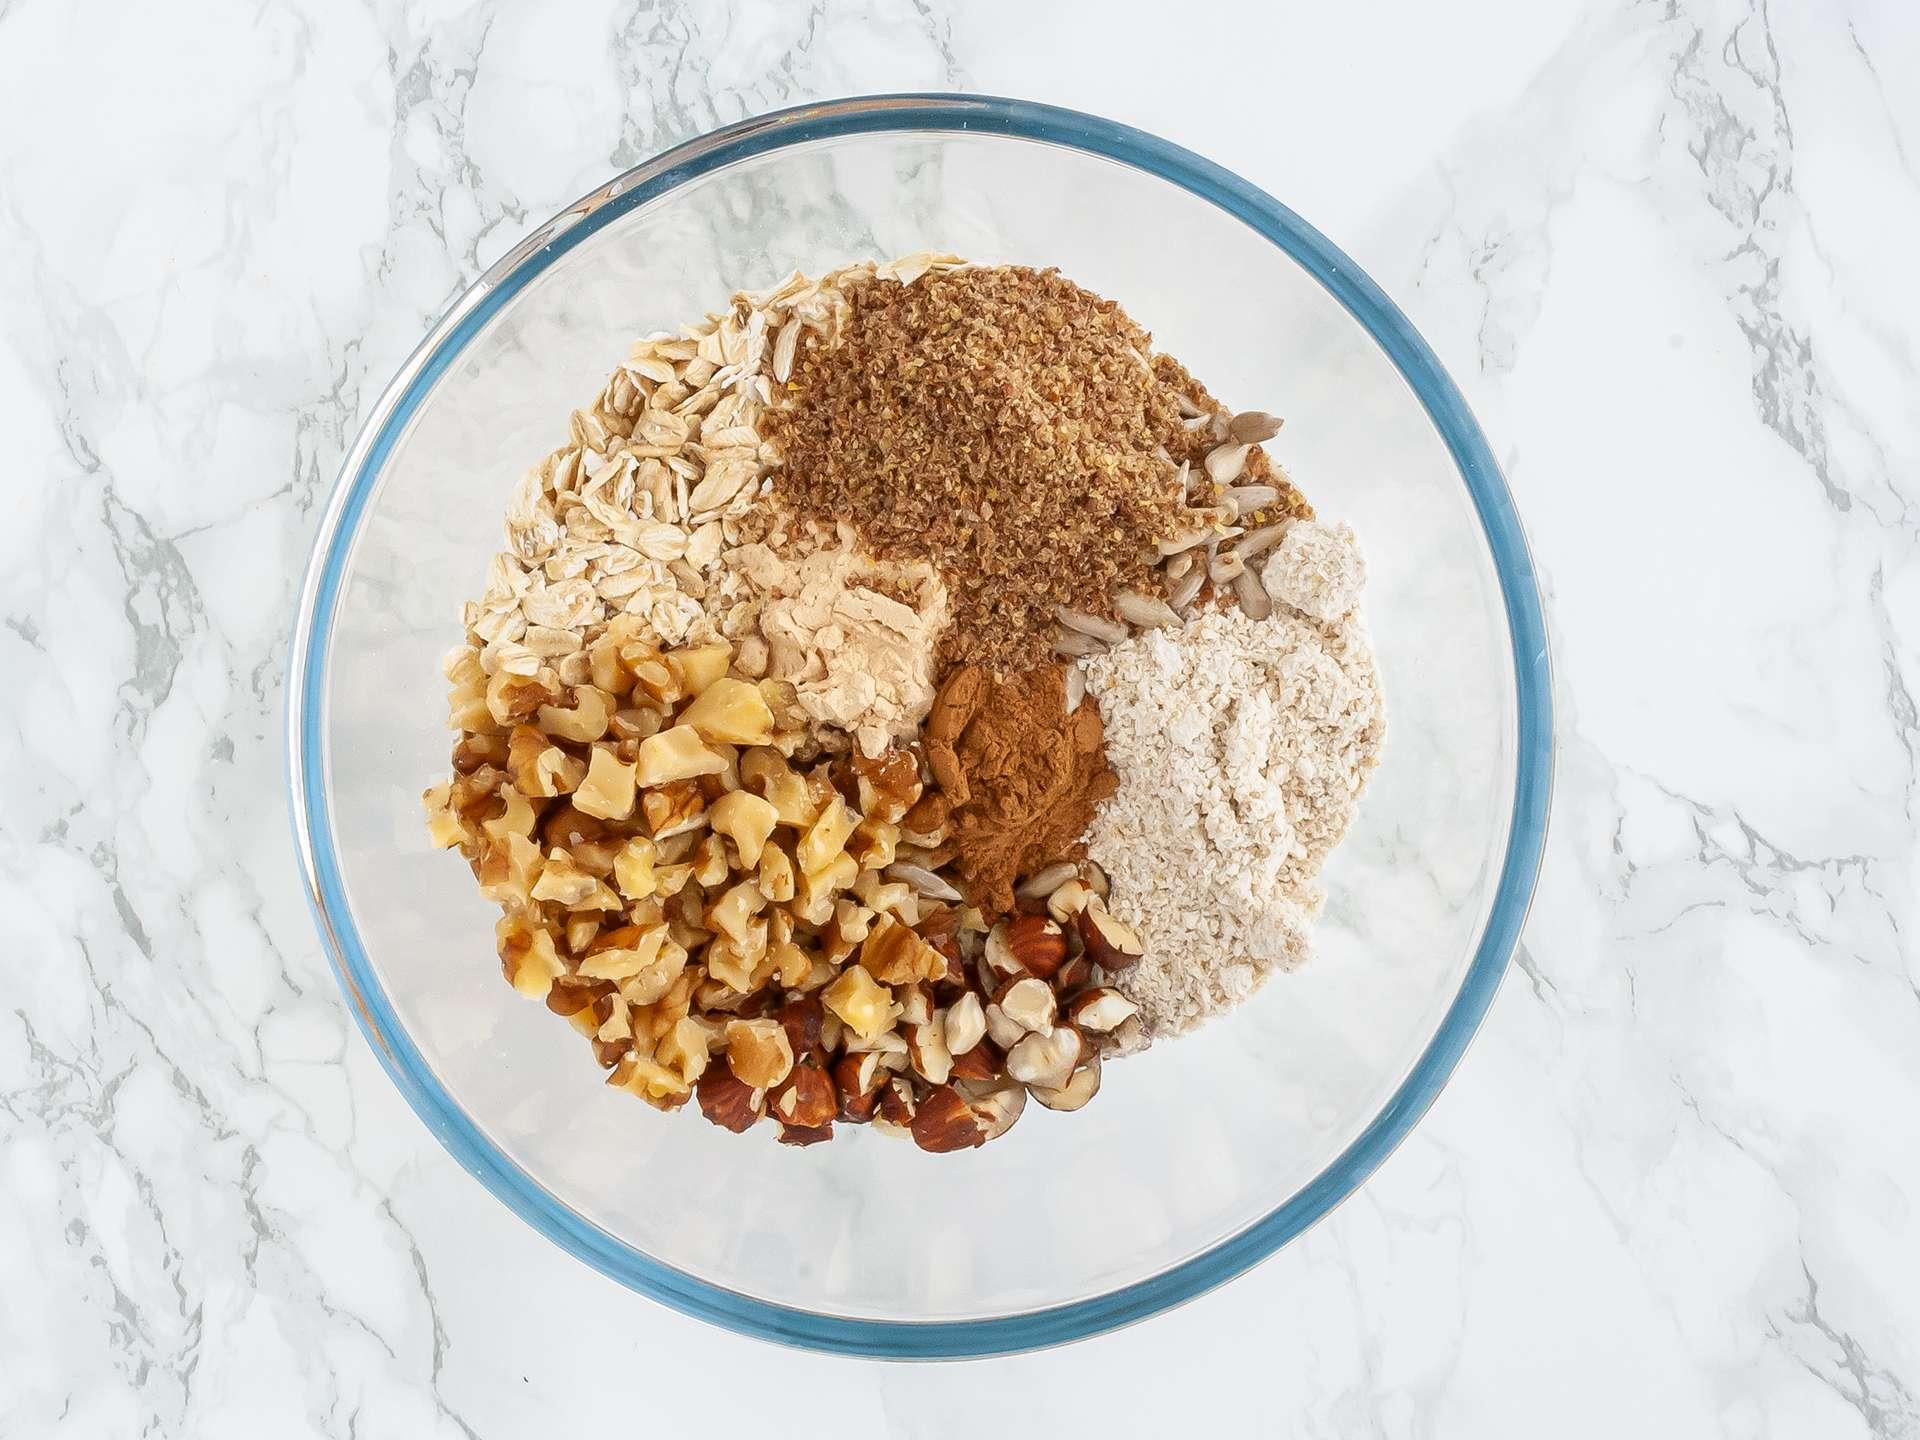 Step 1.1 of Sugar Free Banana and Date Flapjack Recipe